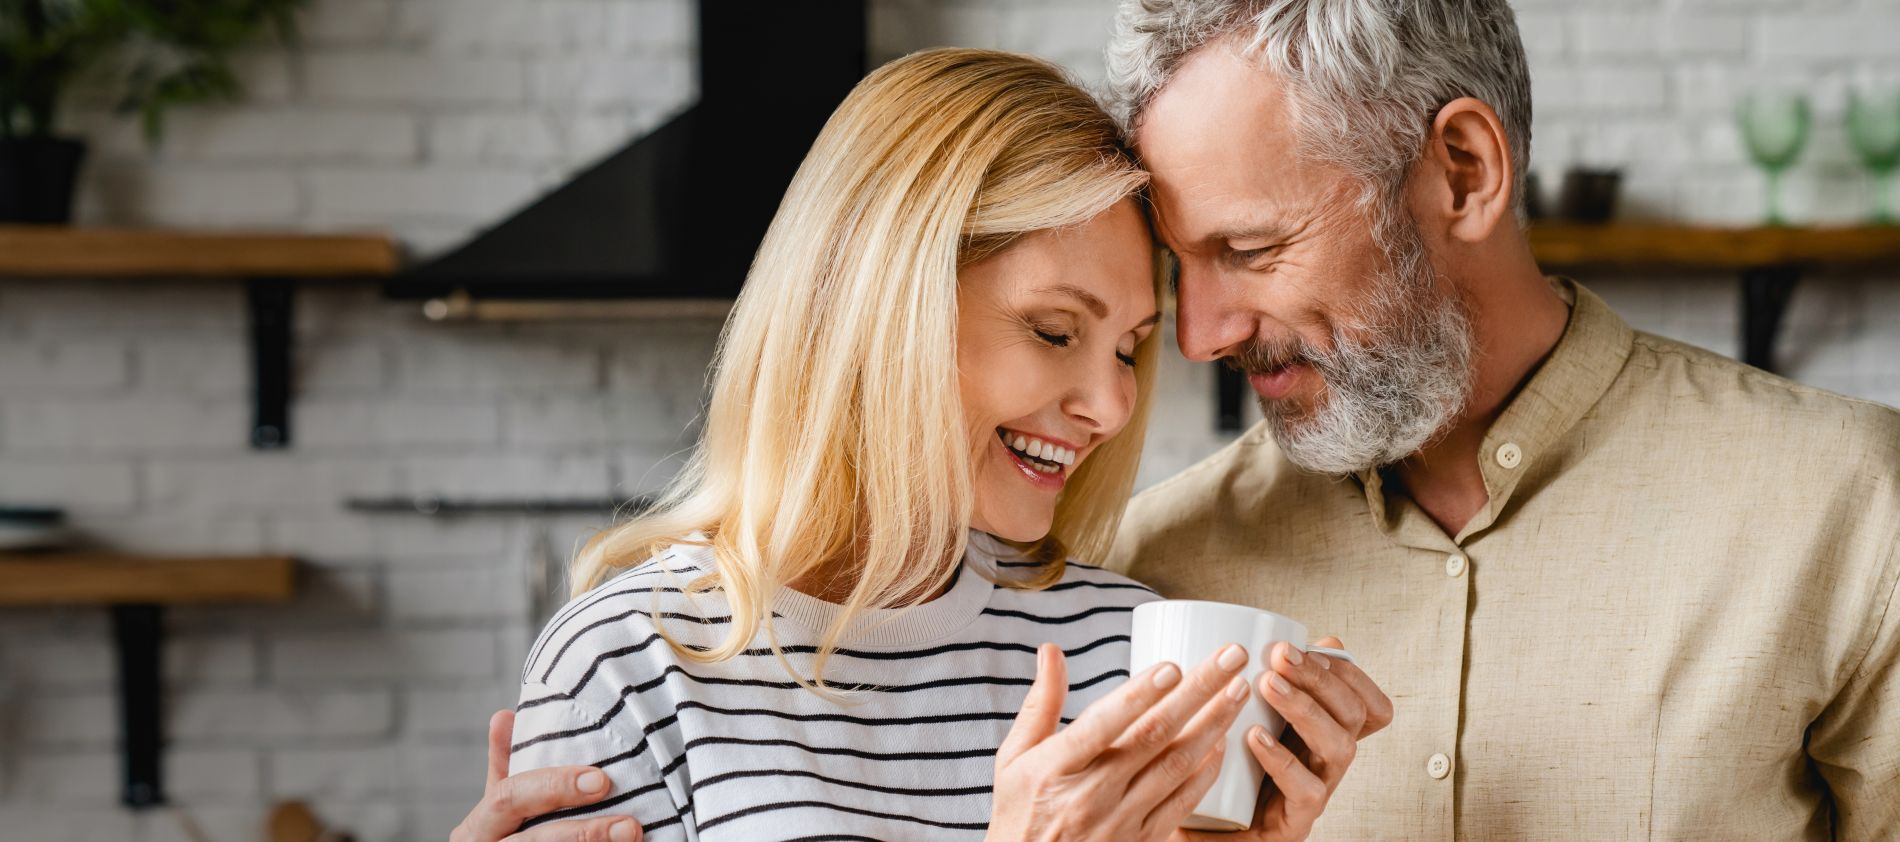 Кредит без истории пенсионерам на недвижимость